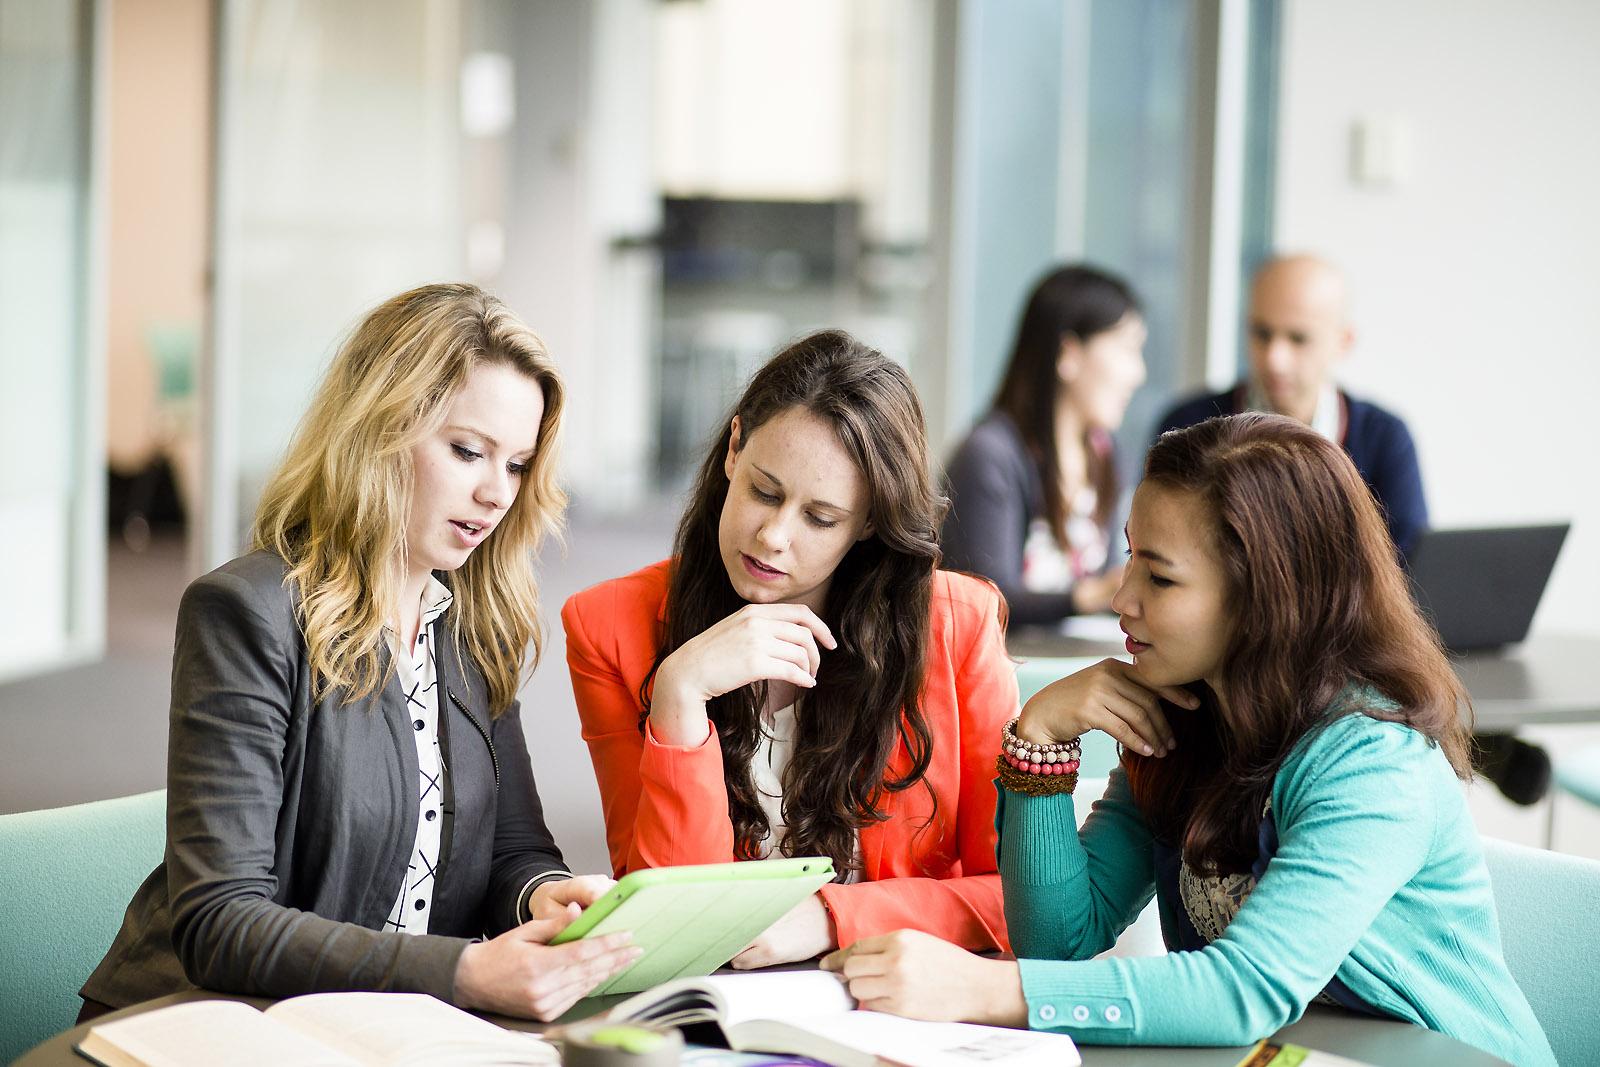 Thesis on job satisfaction among teachers